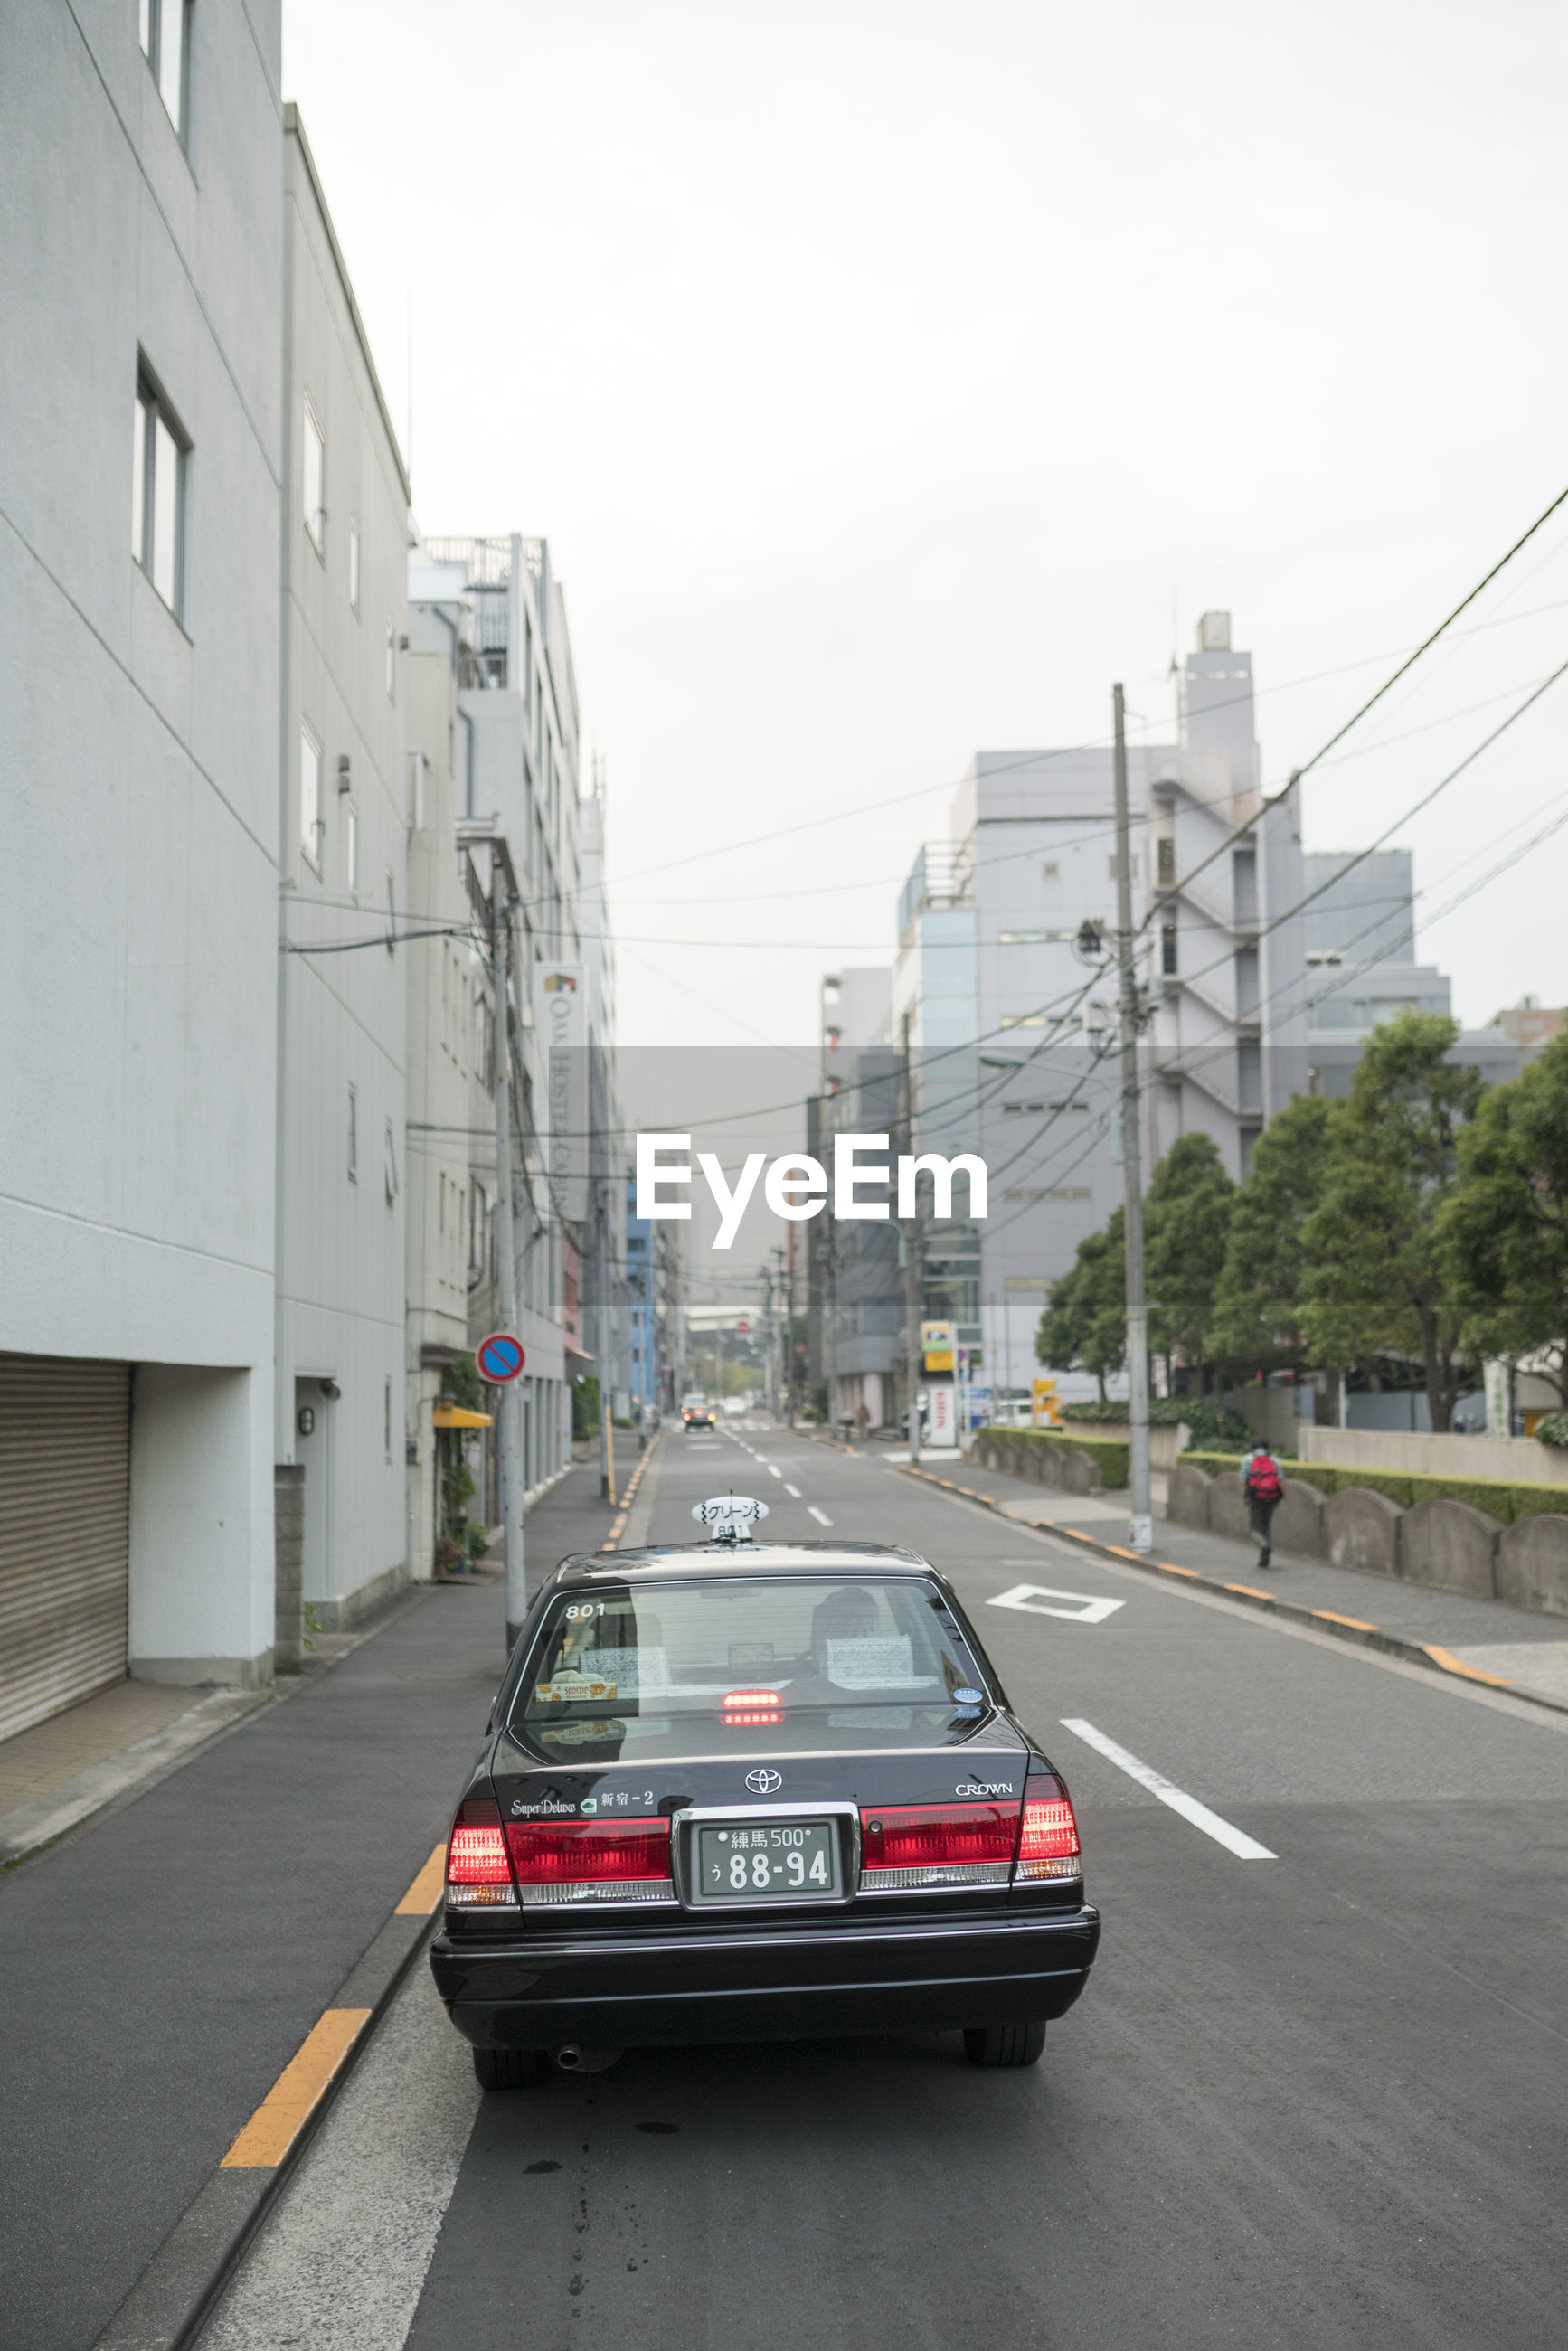 CARS ON STREET BY BUILDINGS AGAINST SKY